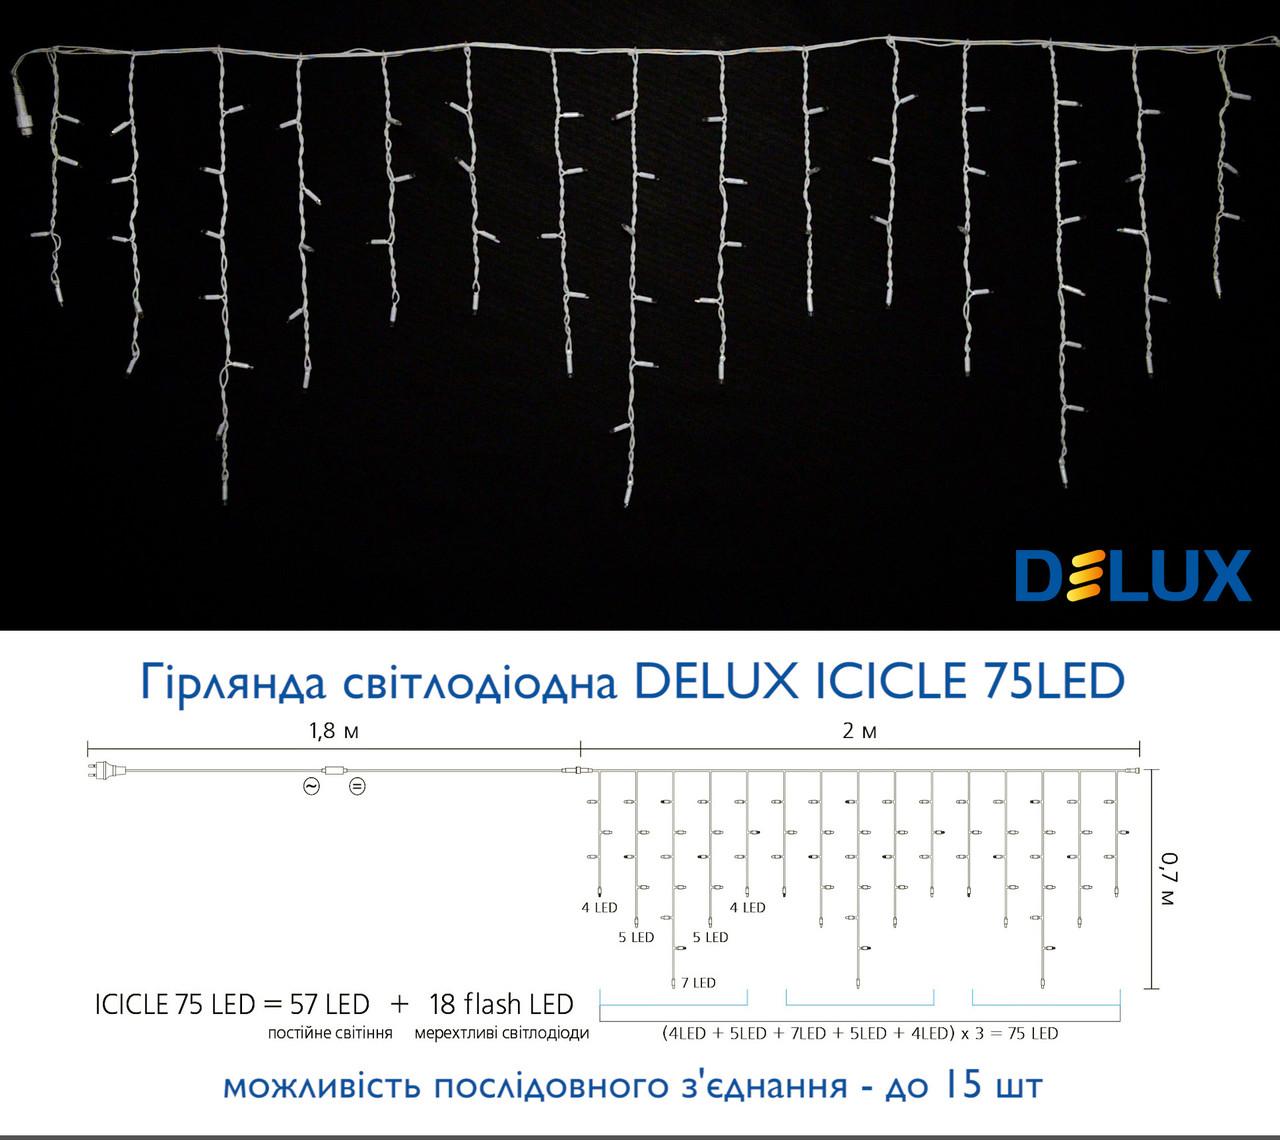 Гирлянда уличная DELUX ICICLE 75LED 2x0.7m 18 flash мул/бел IP44 EN